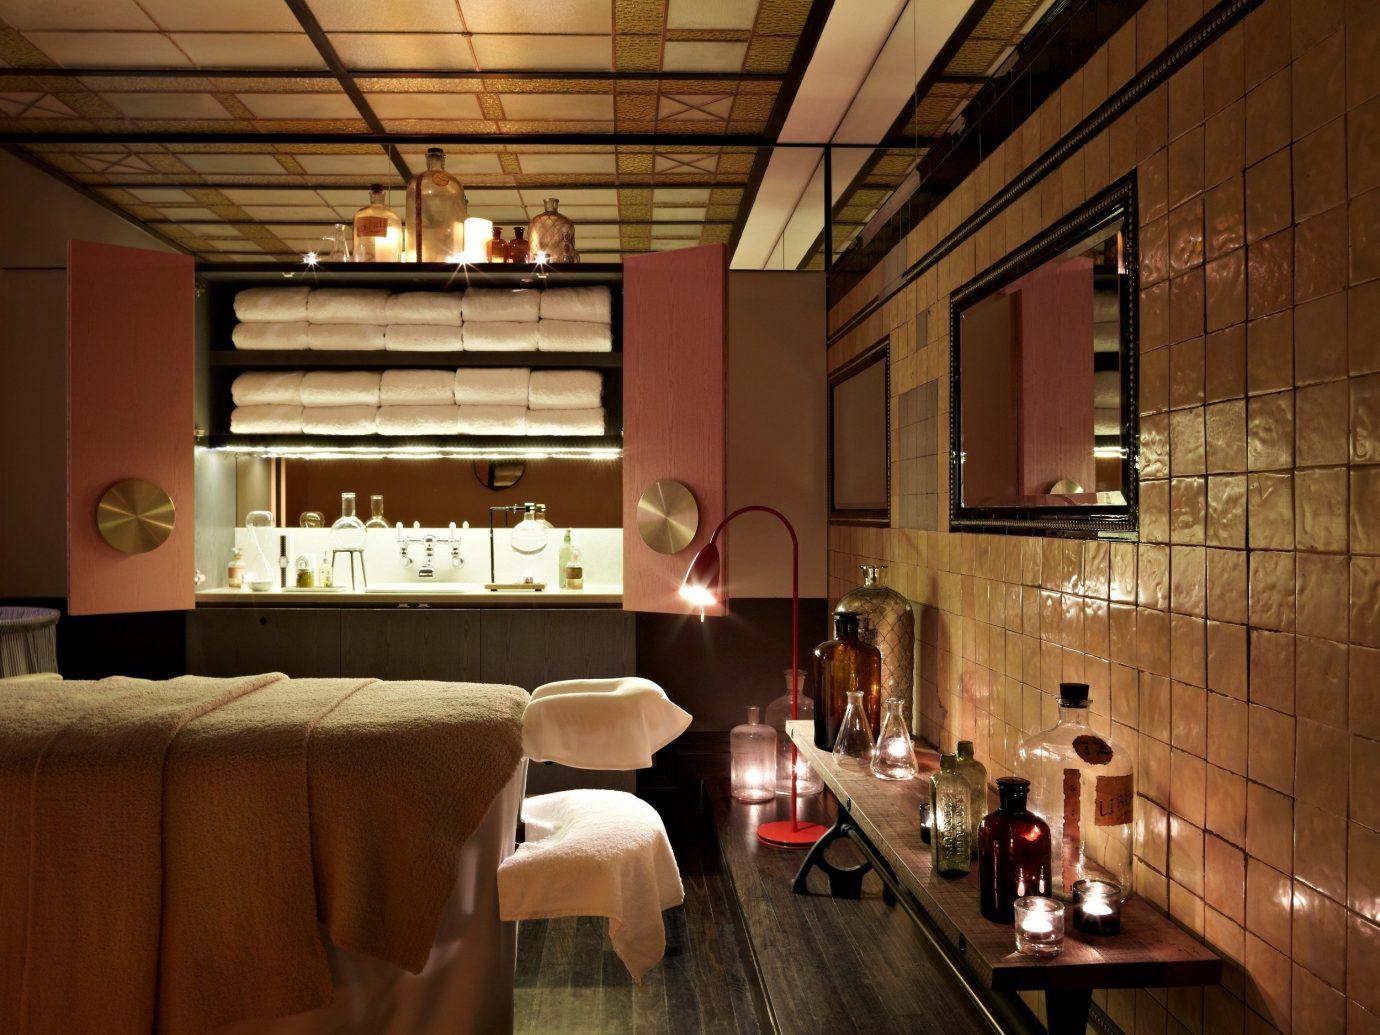 Hotels Romance indoor wall ceiling room interior design restaurant home lighting estate Design living room